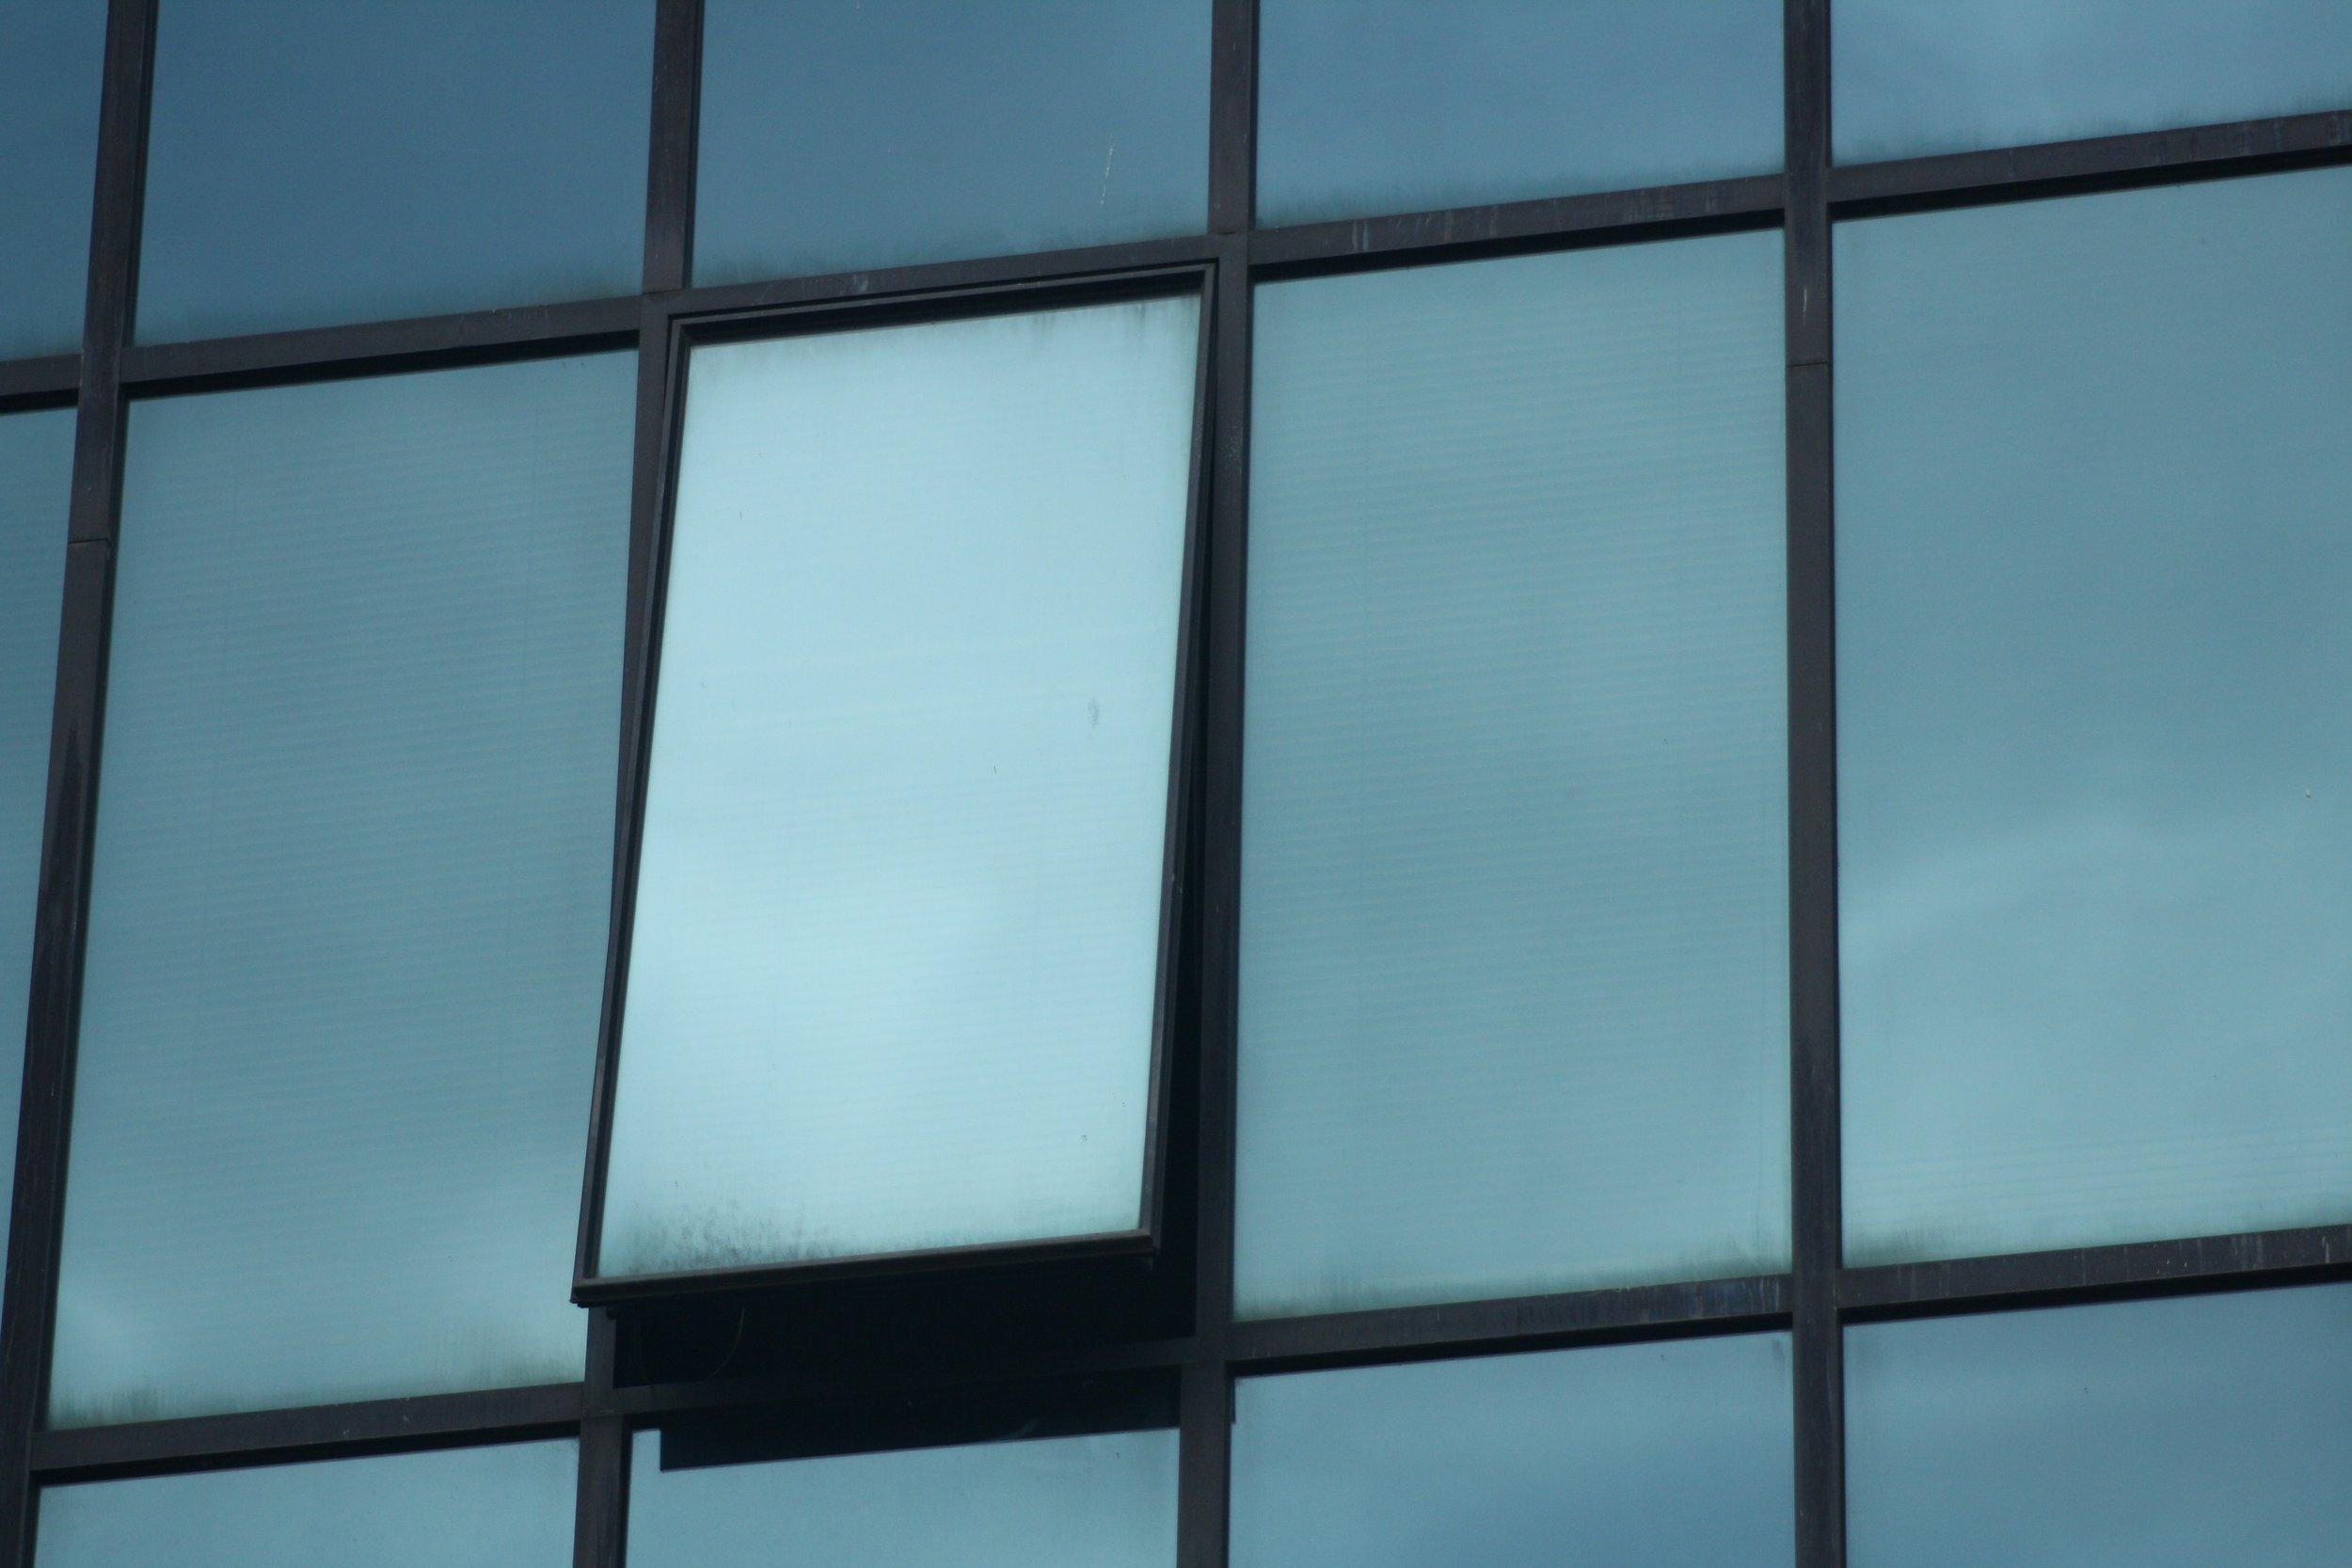 architectural-design-architecture-building-2364122.jpg